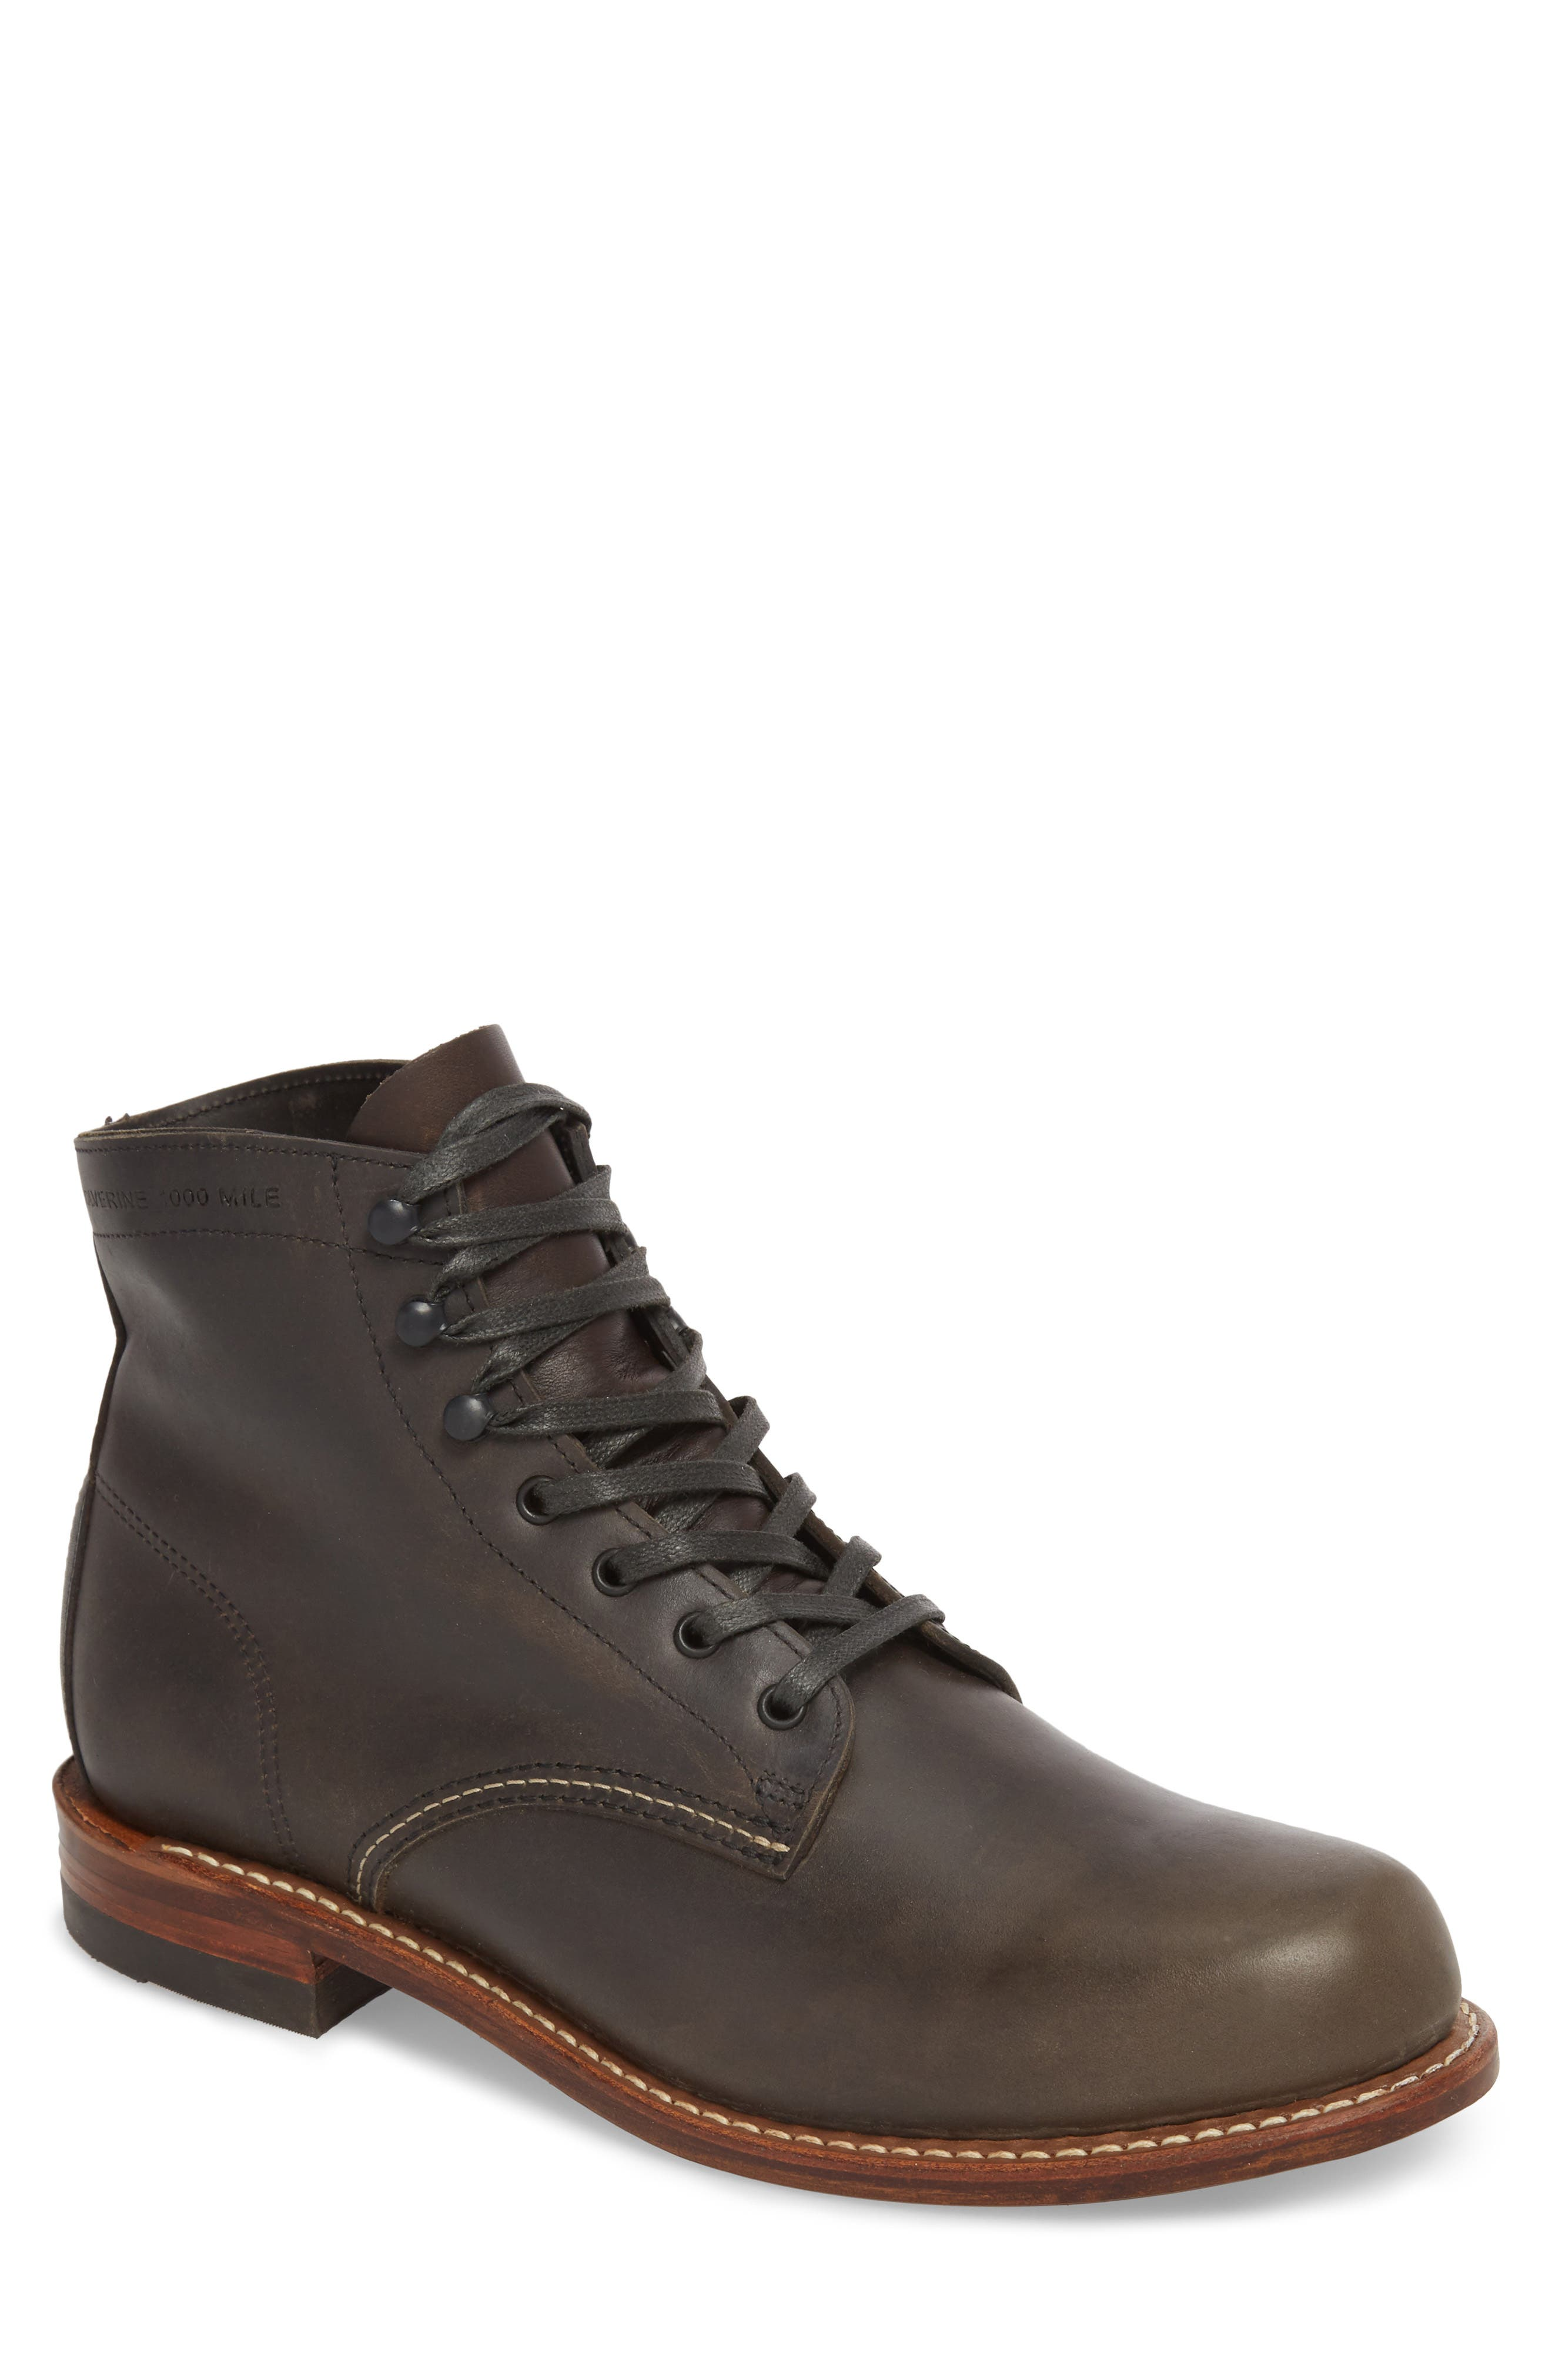 '1000 Mile' Plain Toe Boot,                             Main thumbnail 1, color,                             Charcoal